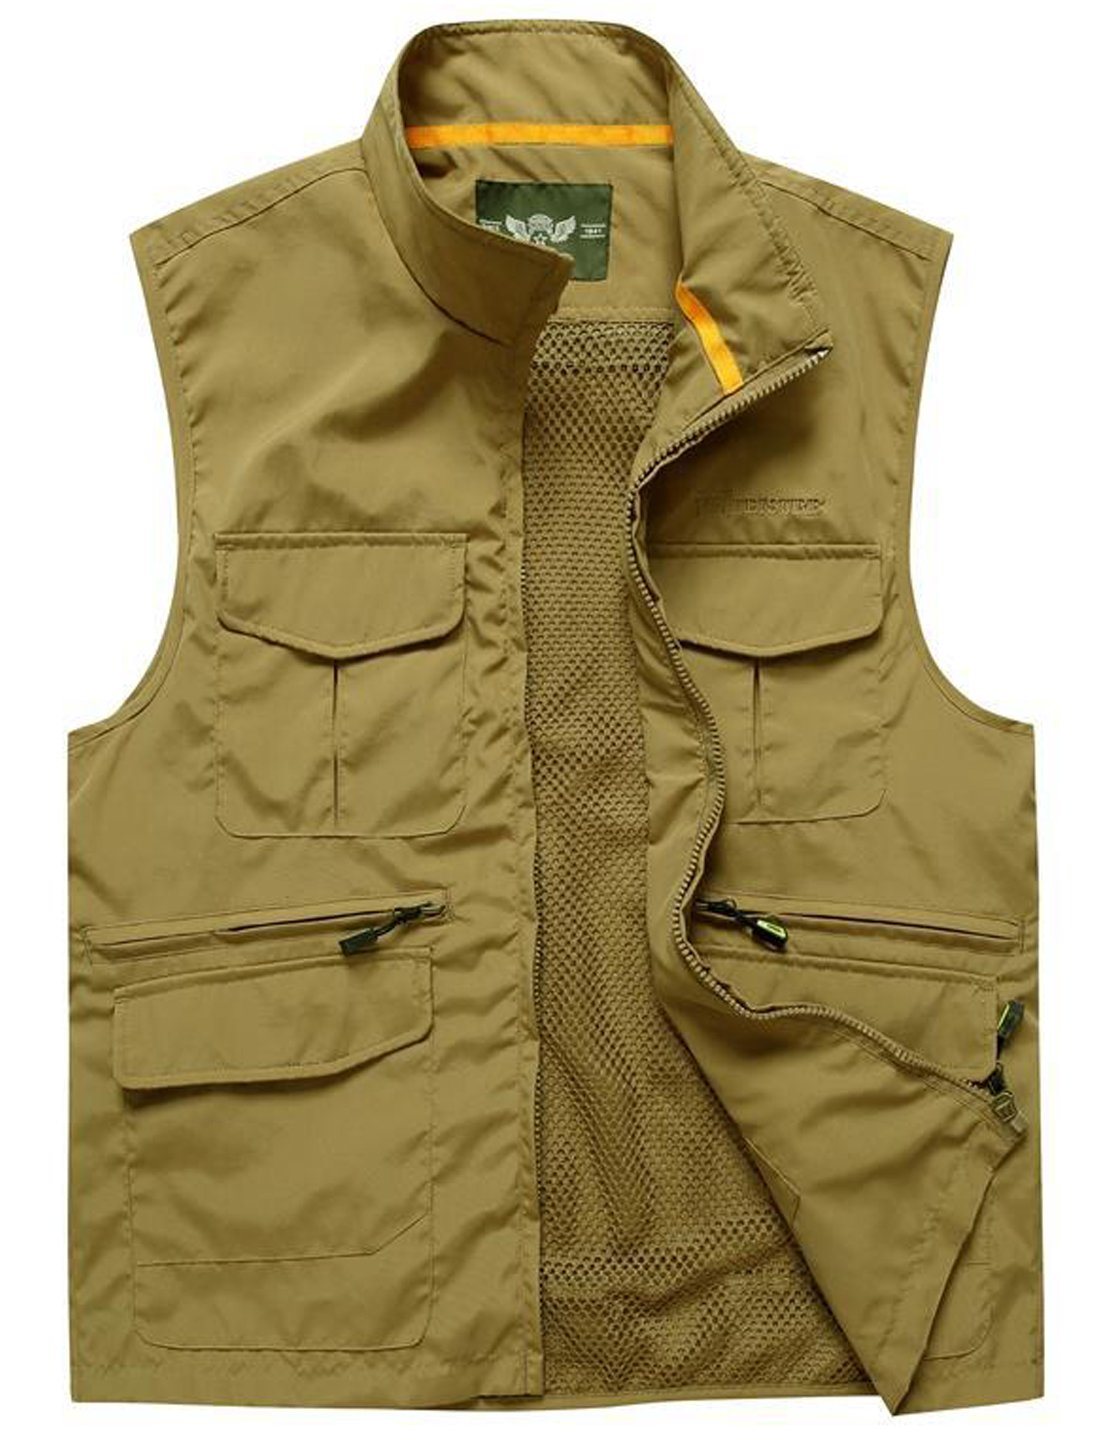 Flygo Men's Leisure Mutiple Pockets Outdoors Vest Sleeveless Jacket (Small, Khaki) by Flygo